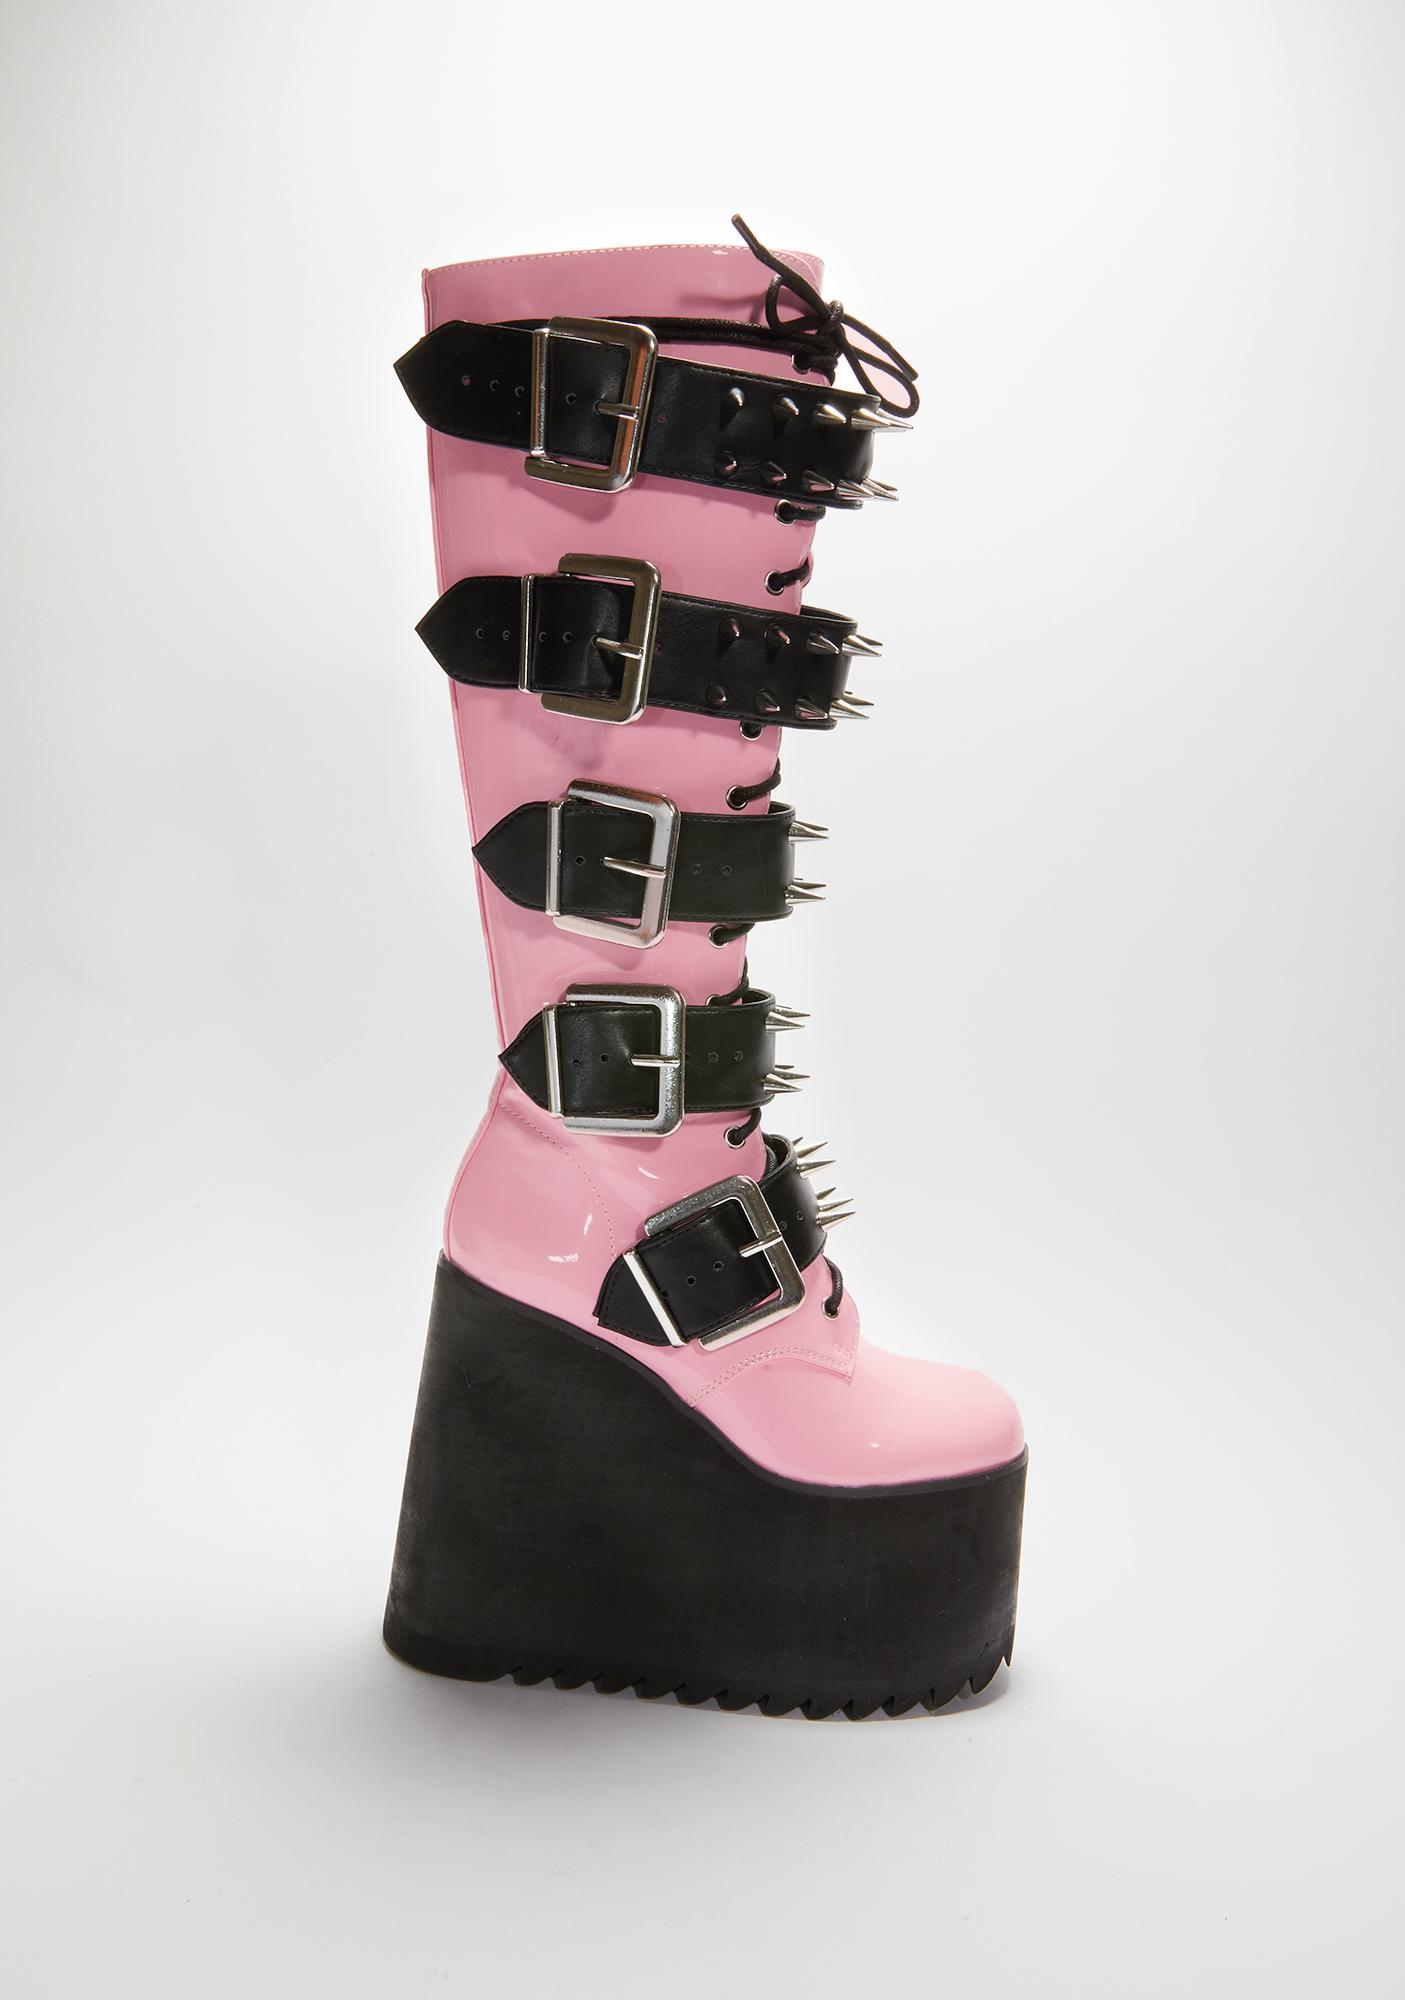 Widow Sweet Appetite For Destruction Platform Boots